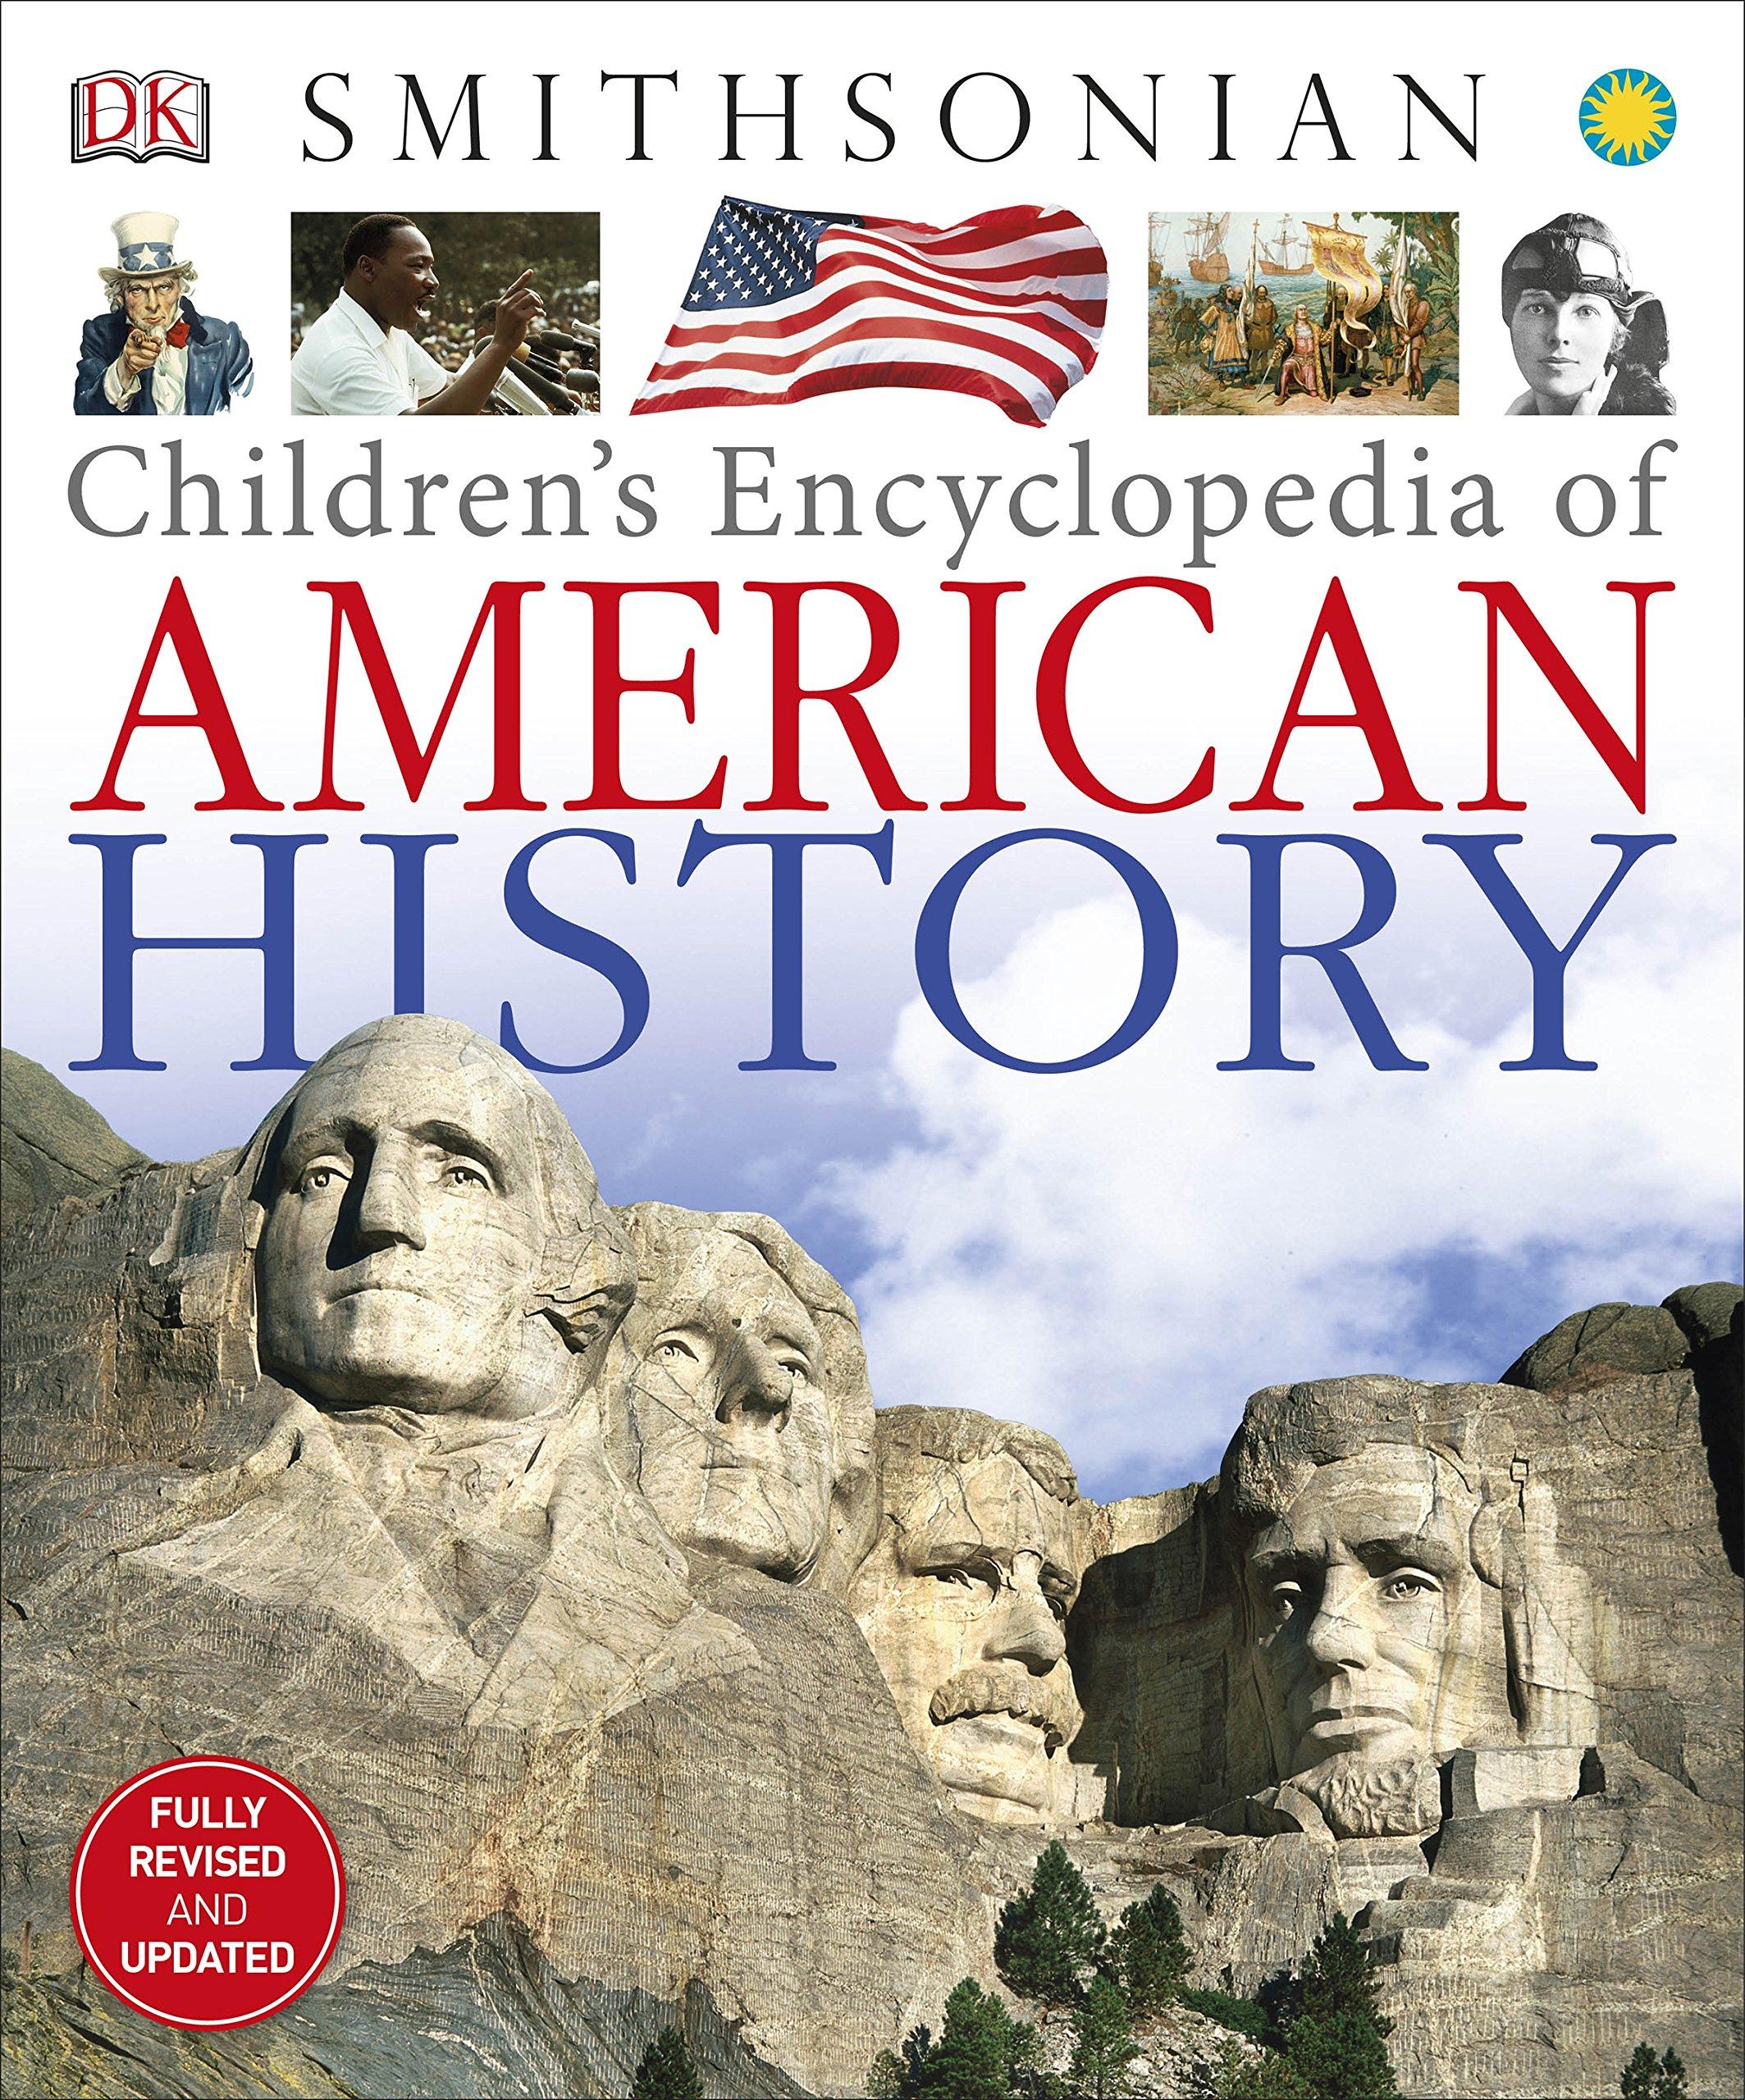 Childrens Encyclopedia American History DK